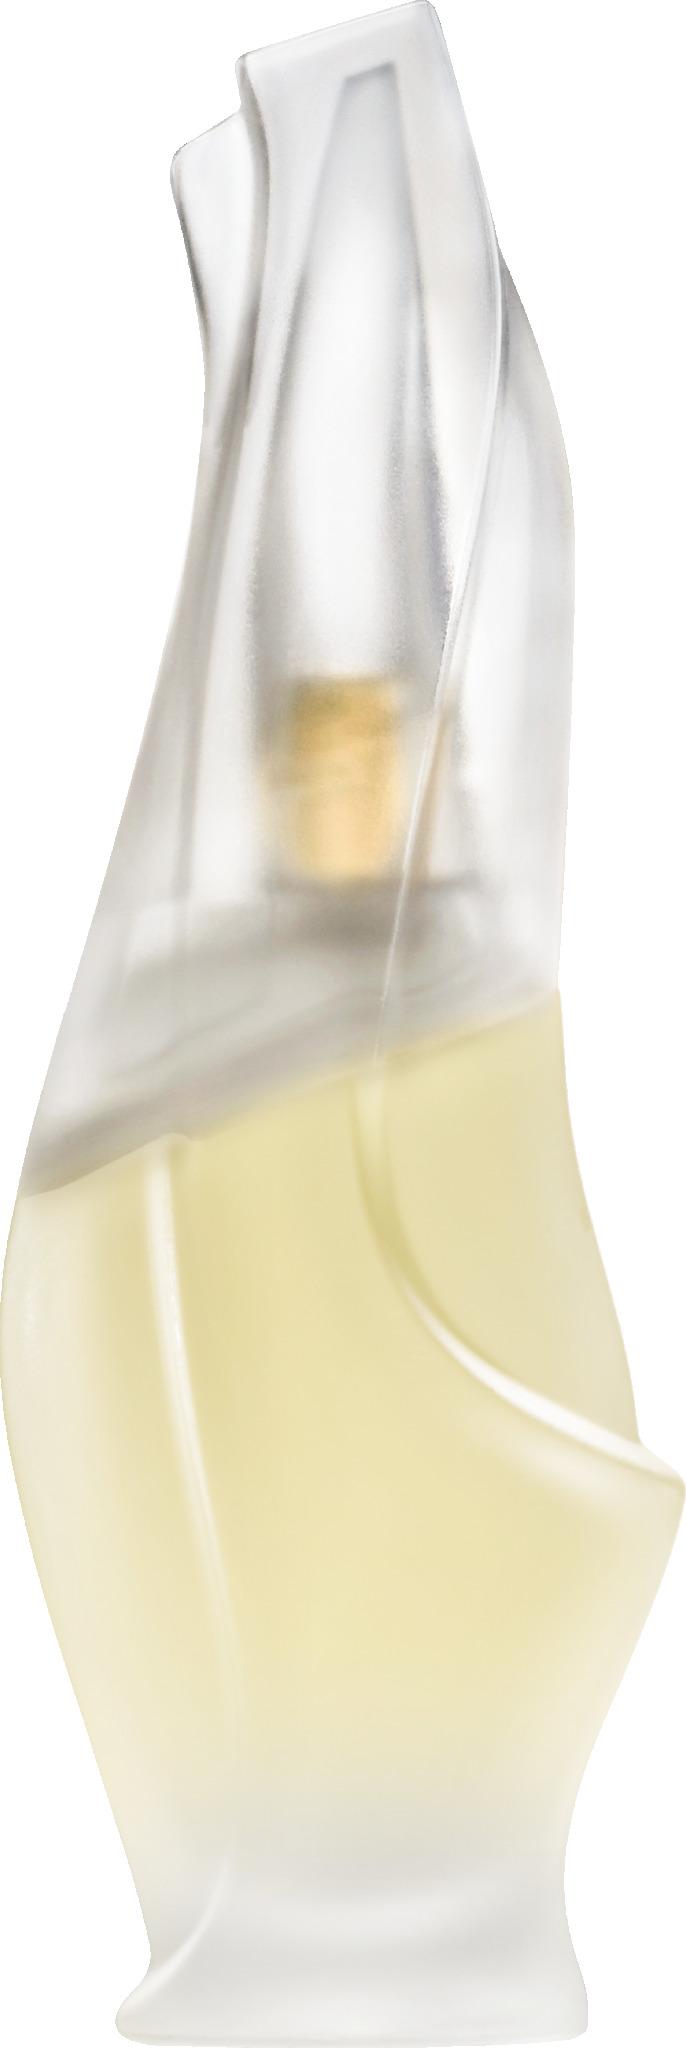 DKNY Cashmere Mist EDT, 50 ml